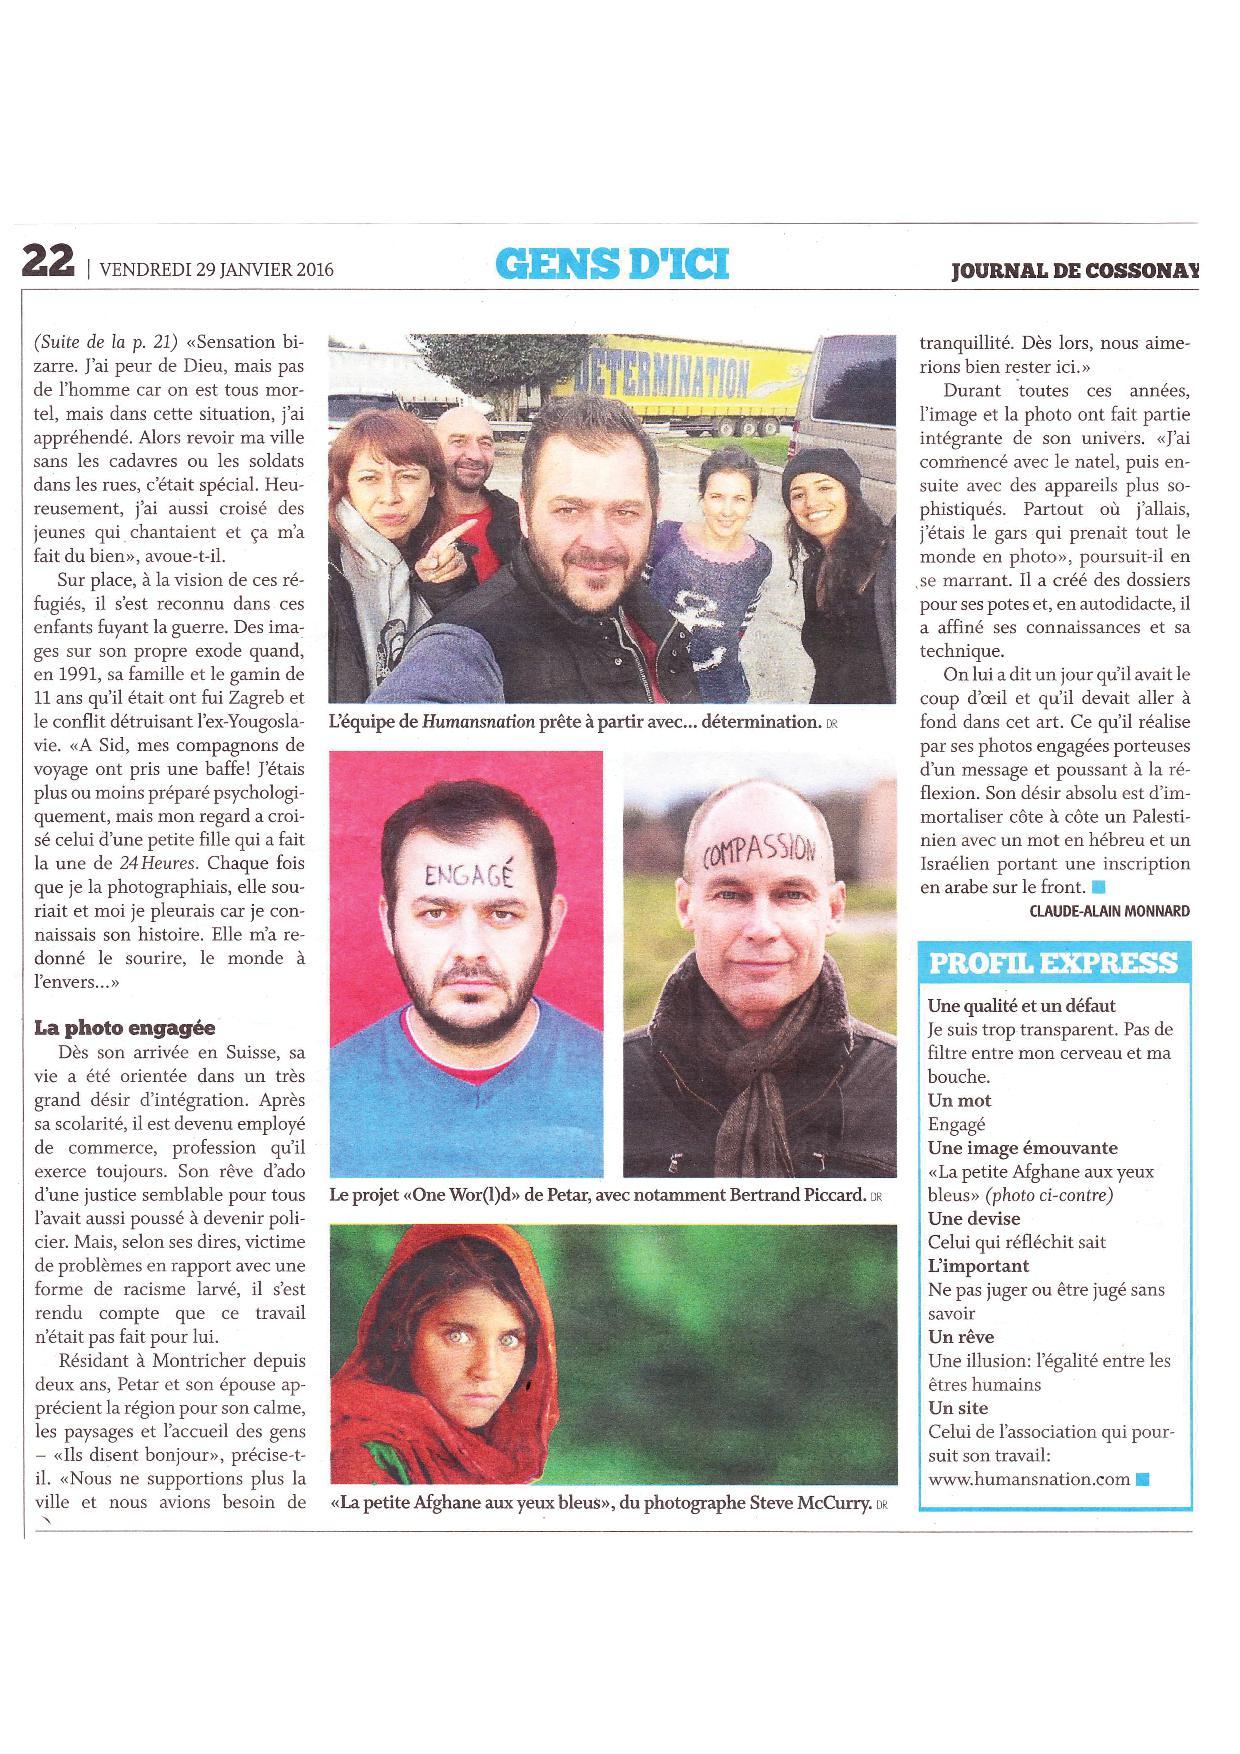 Journal de Cossonay - Vendredi 29 janvier 2016 - Page 2